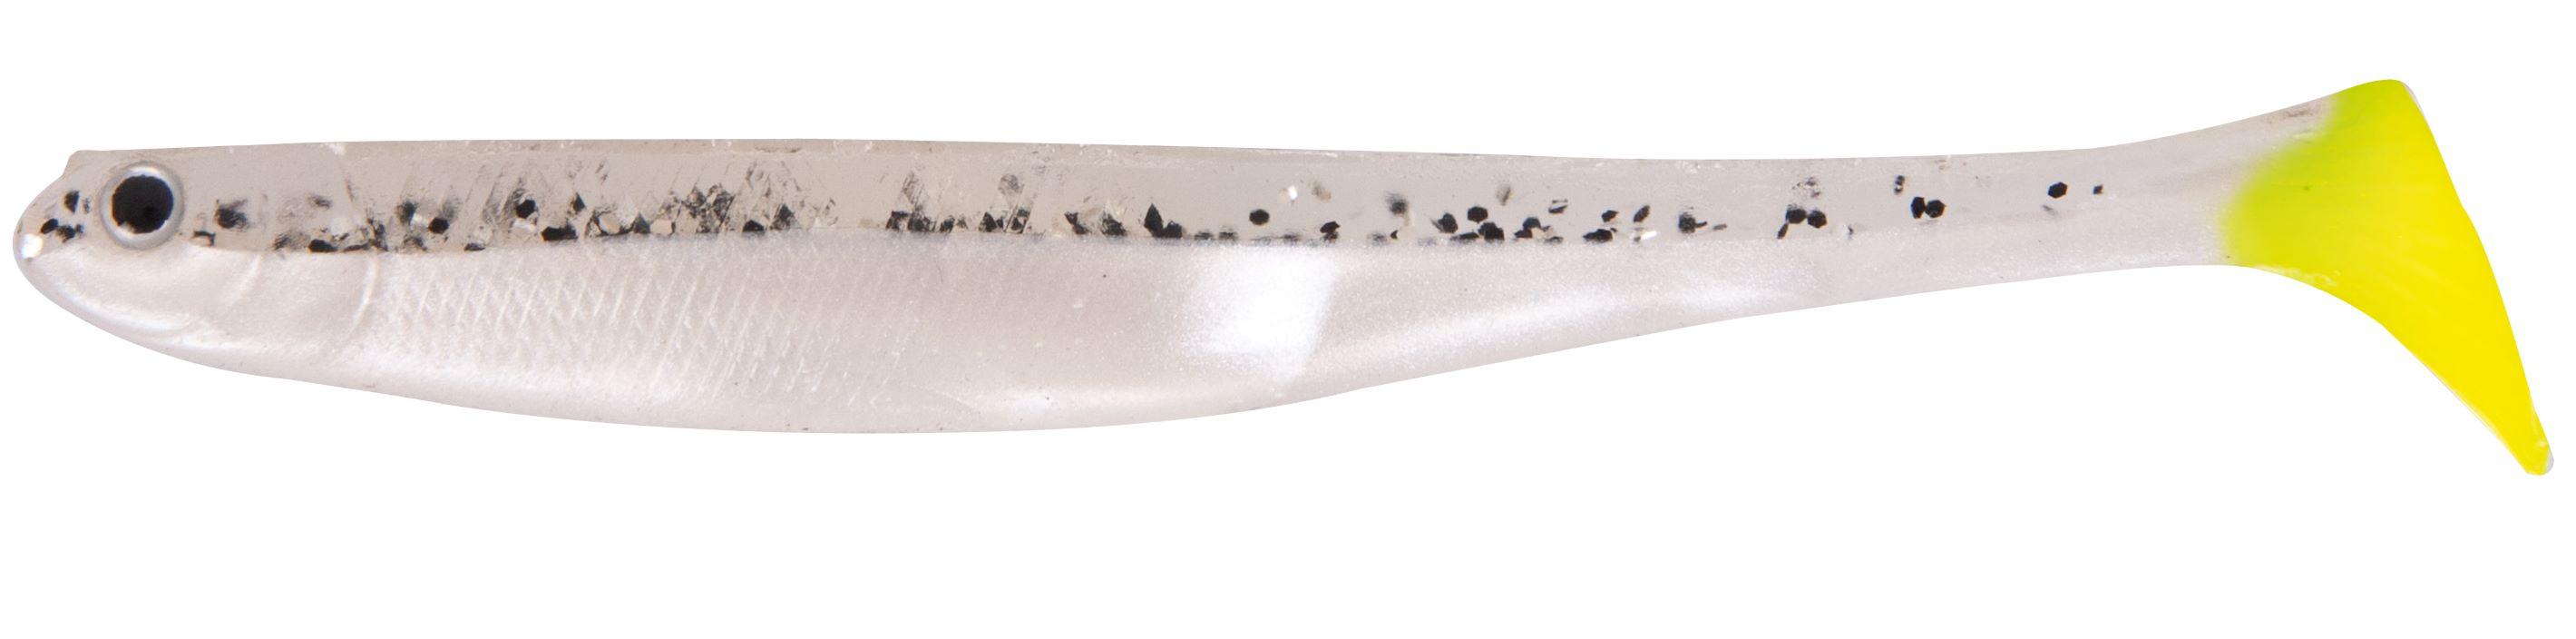 Iron Claw gumová nástraha Slim Jim 16 cm Vzor CT, box 16 ks